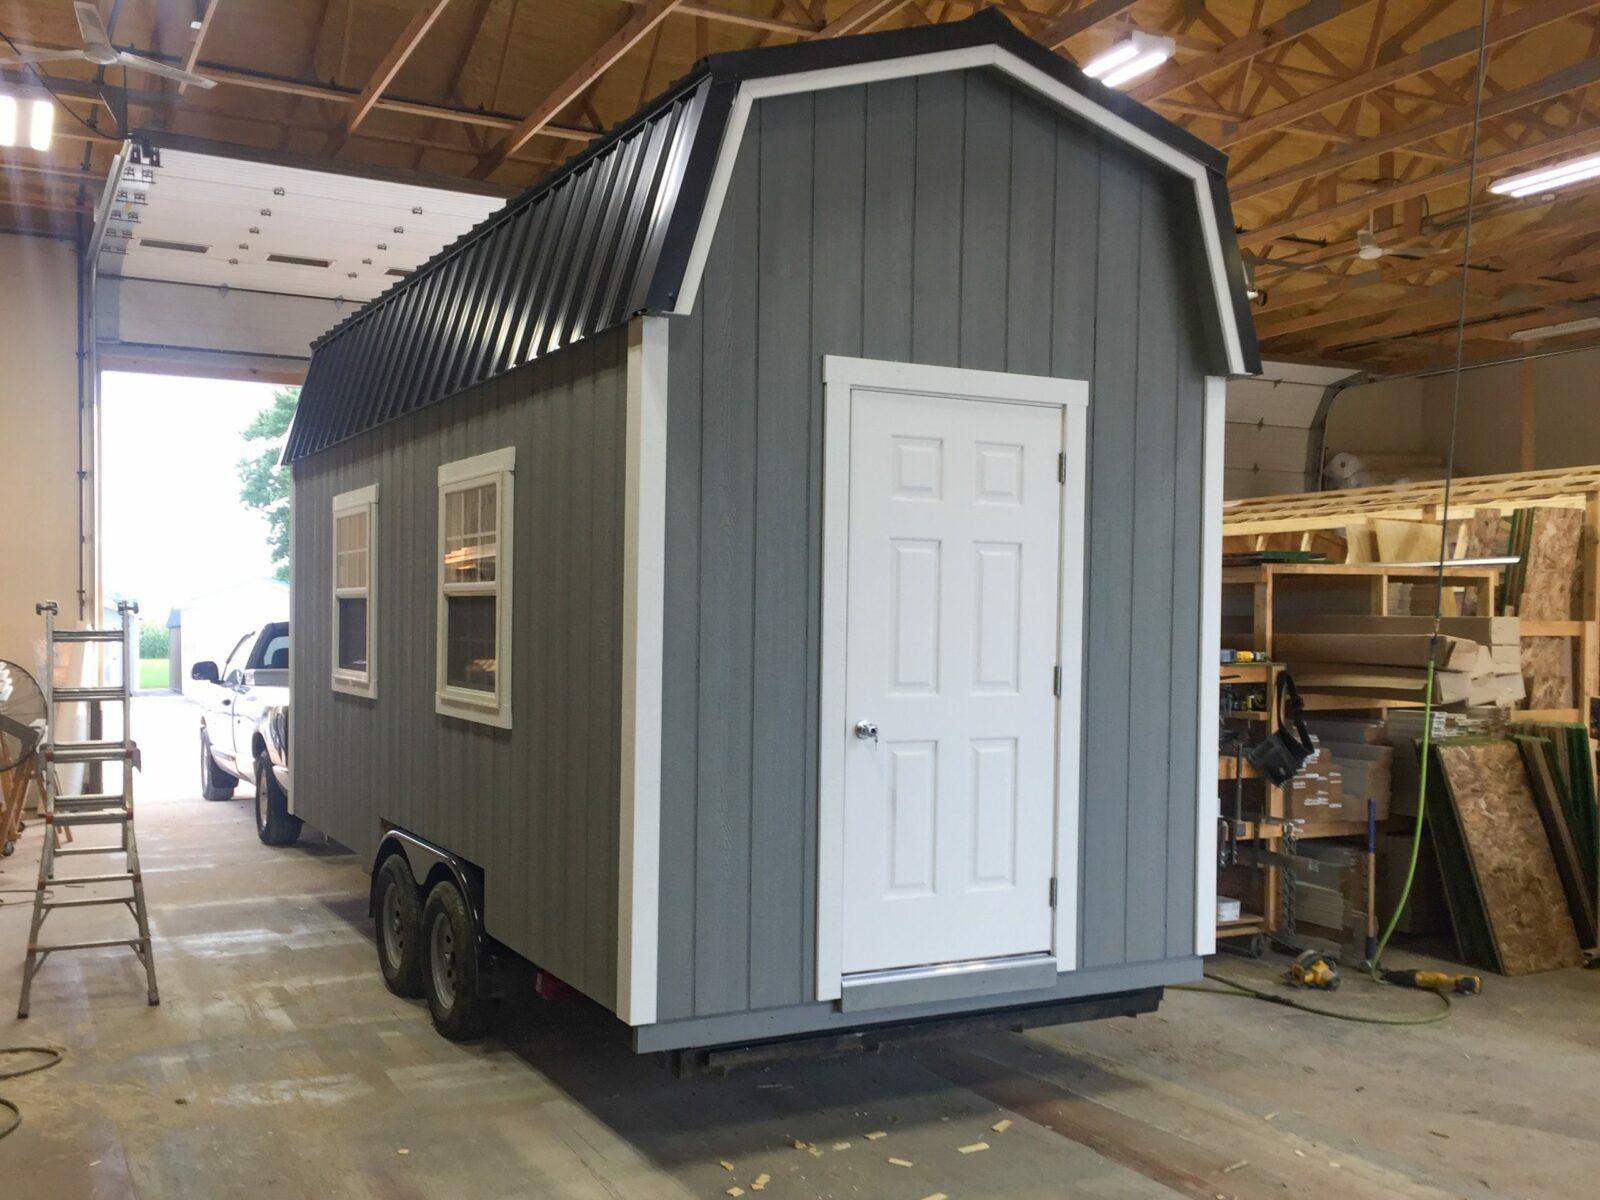 custom tiny home prefab cabin shell built on trailer in ohio